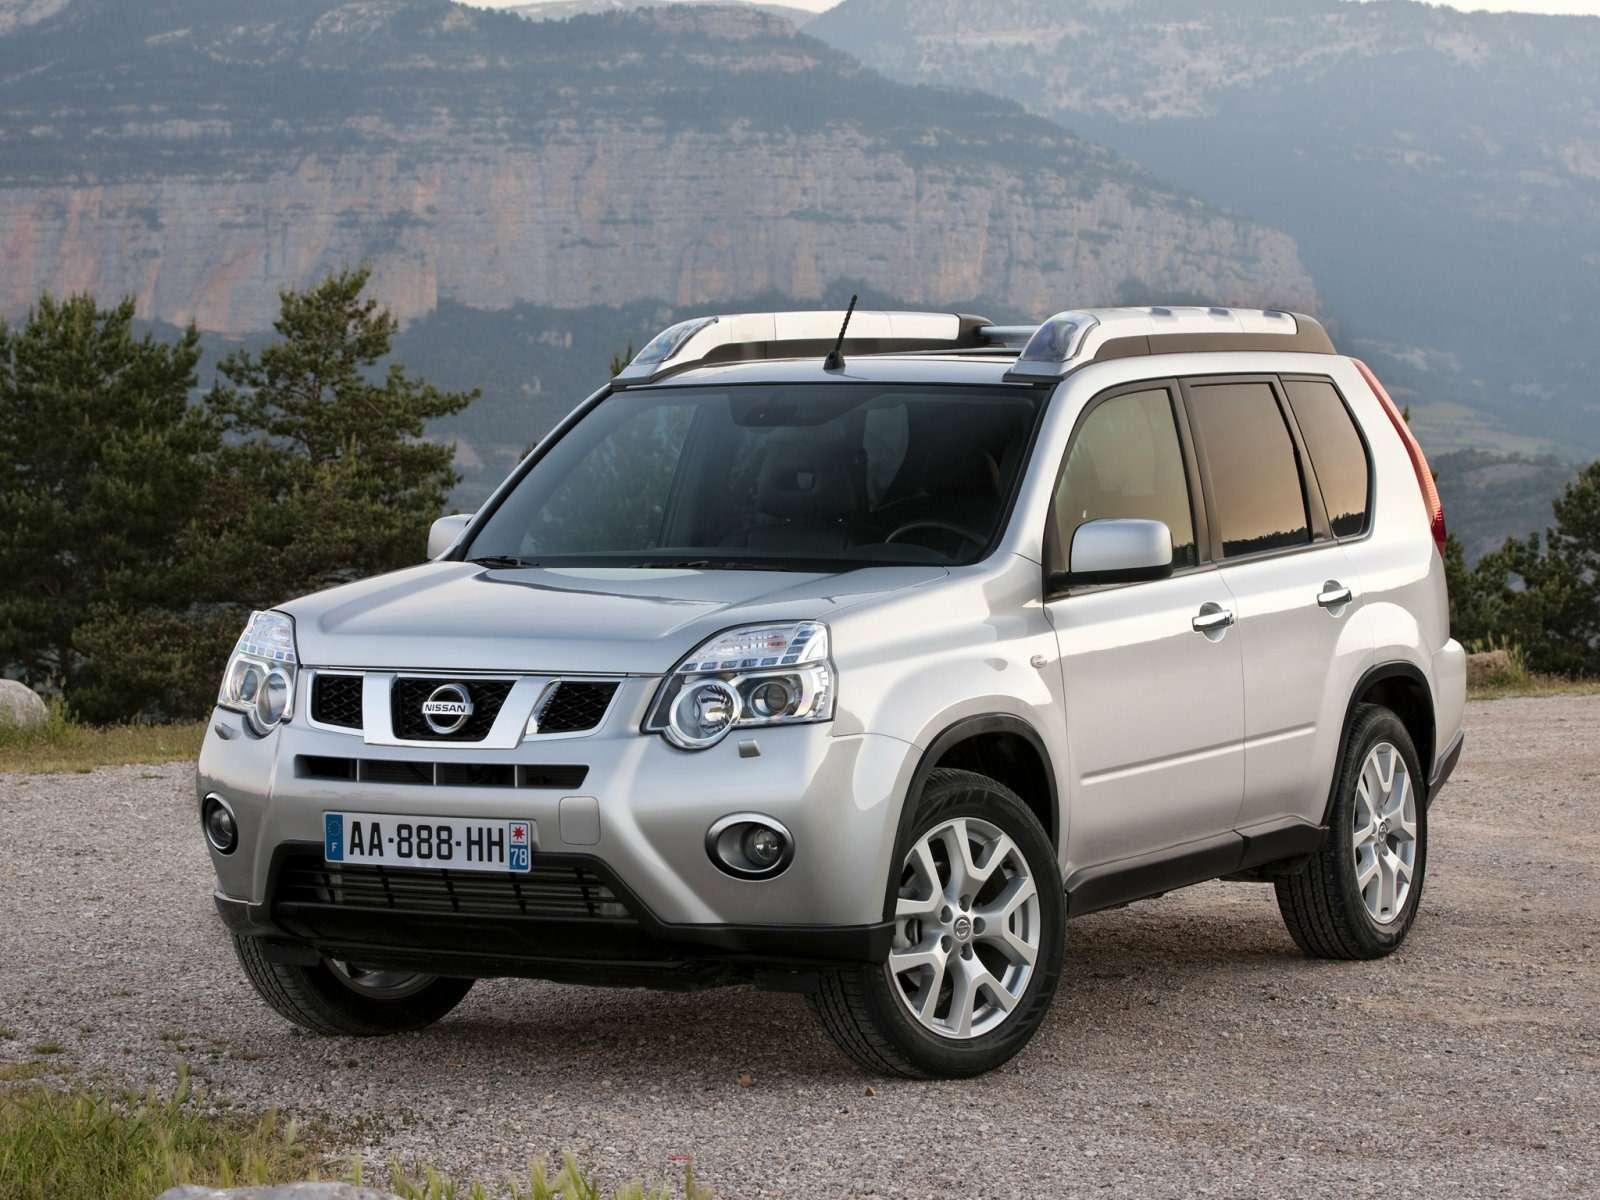 Nissan_X-Trail_SUV 5door_2010